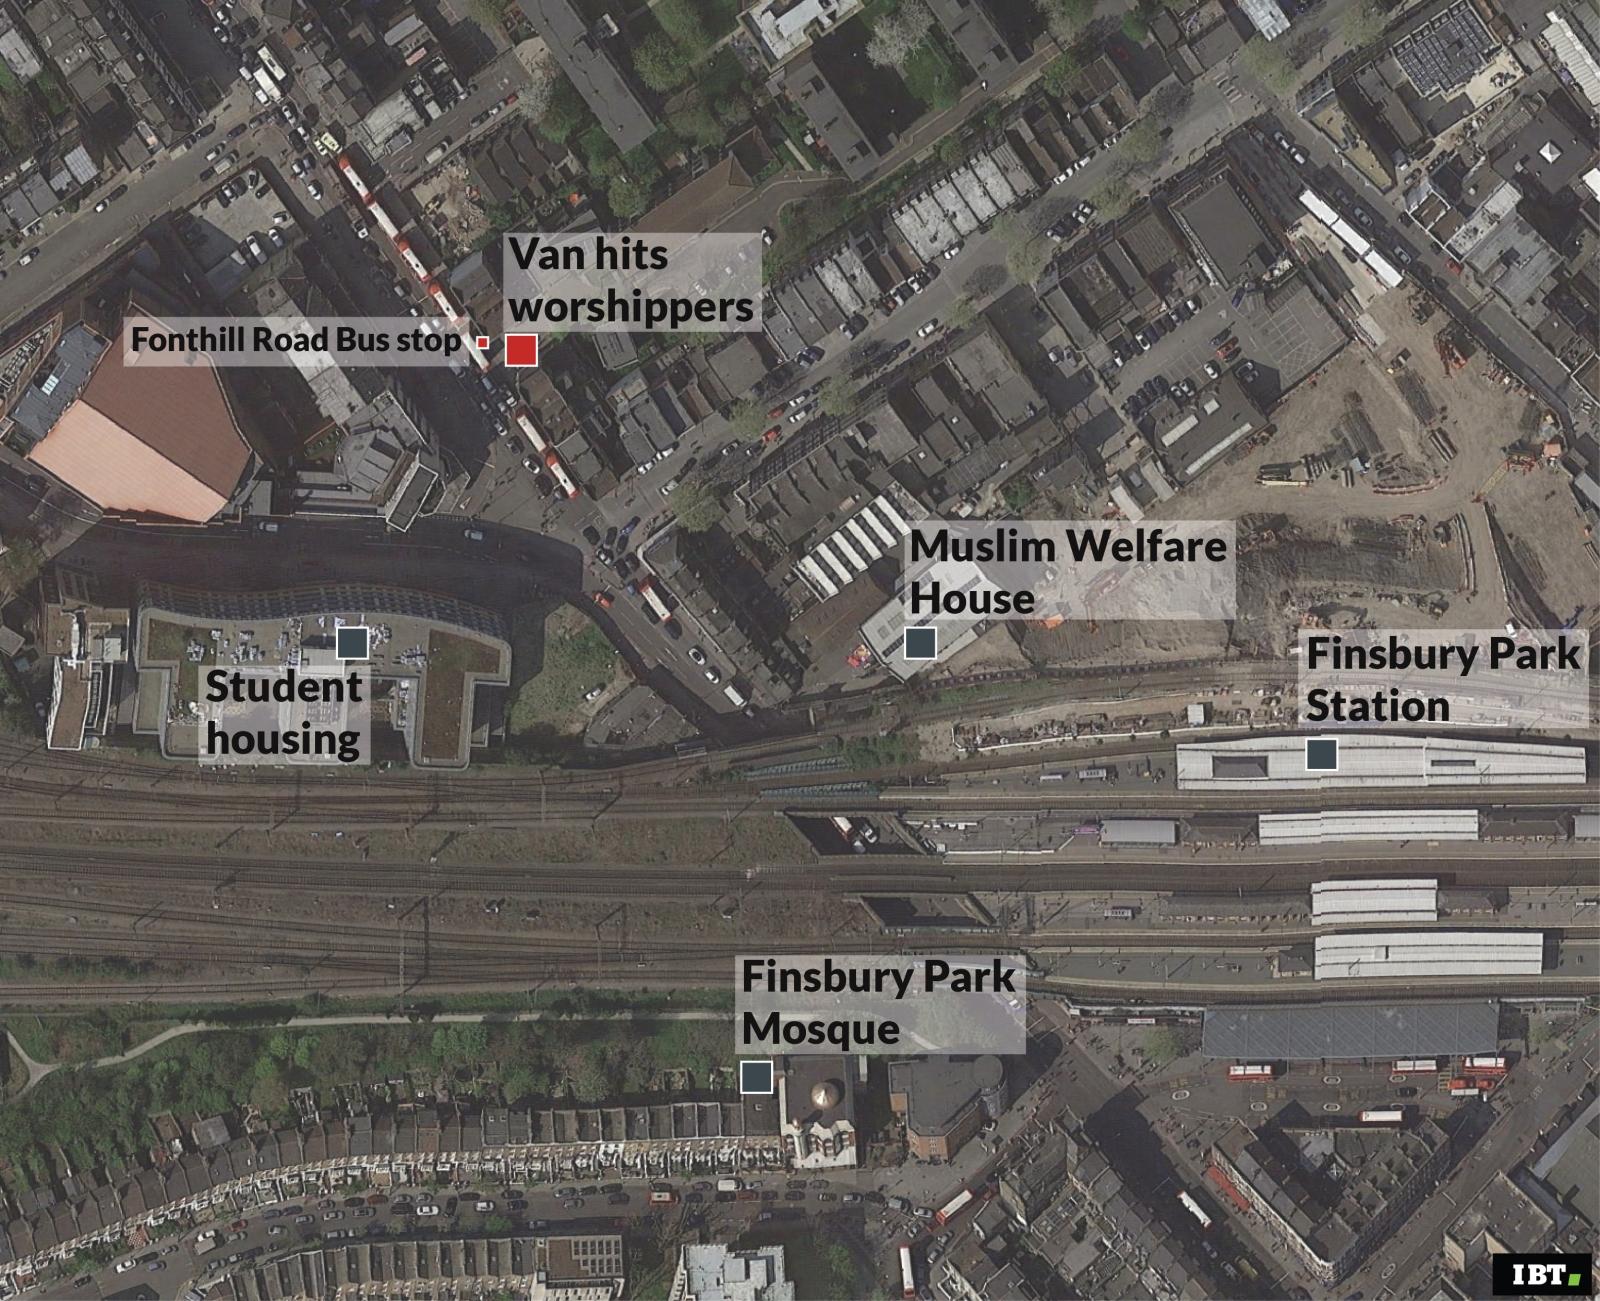 Finsbury Park: van hits warshippers